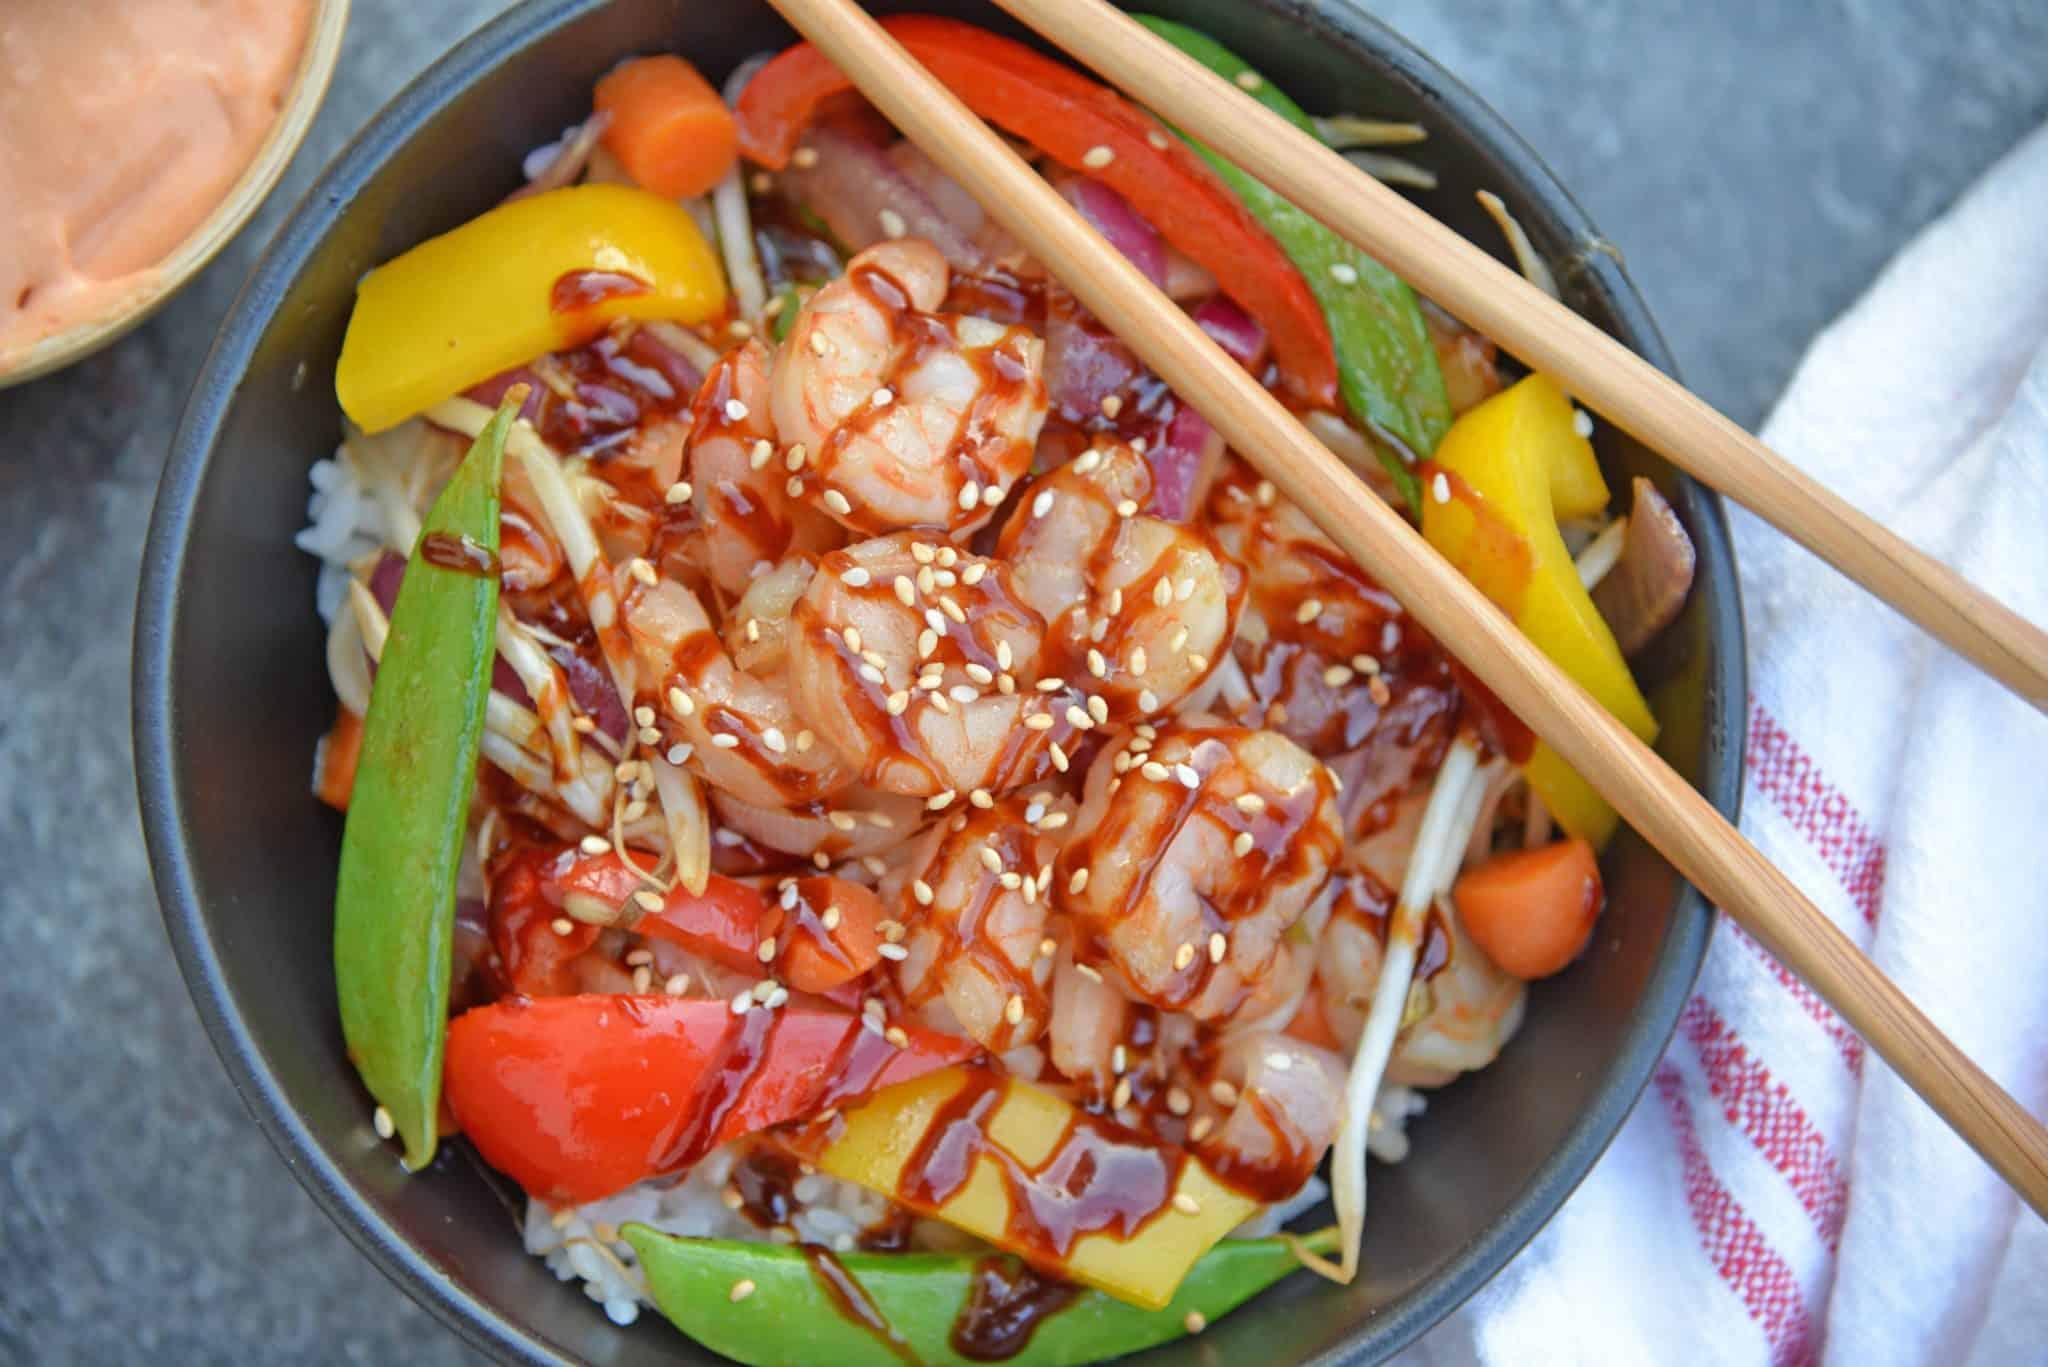 Teriyaki Shrimp Stir Fry in a black bowl